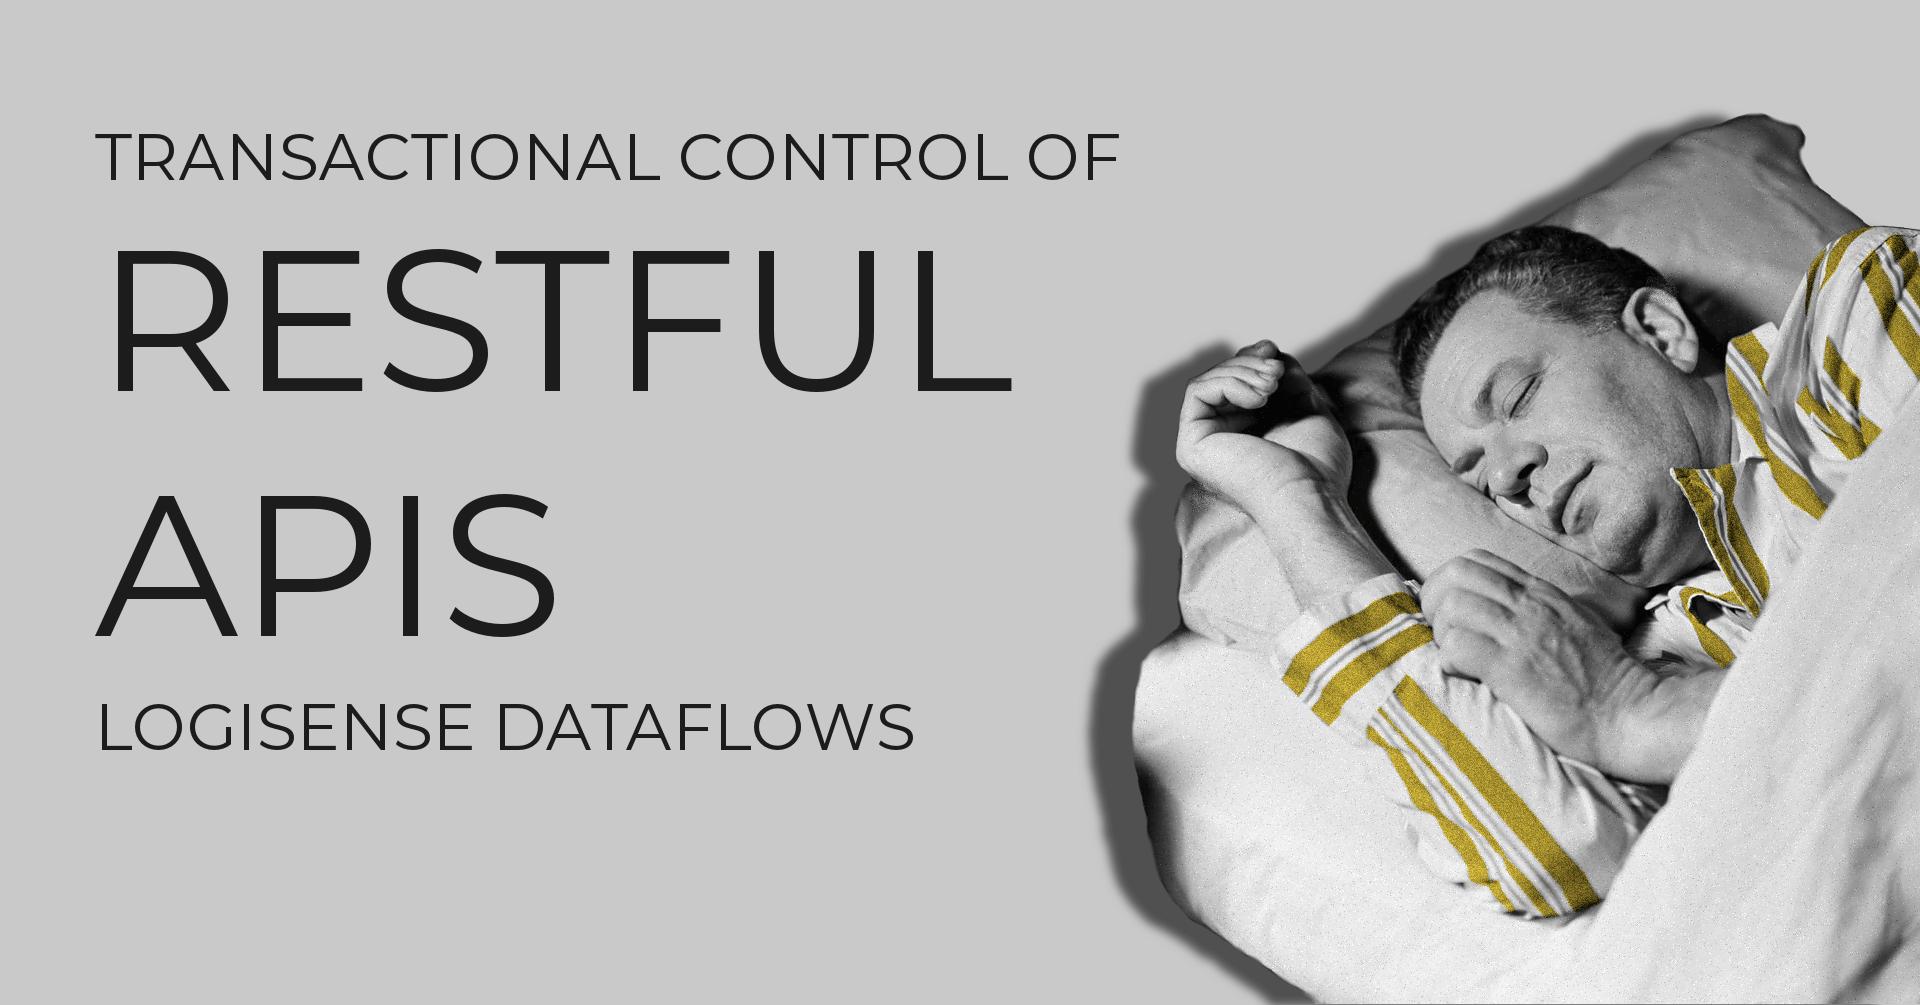 Restful APIs